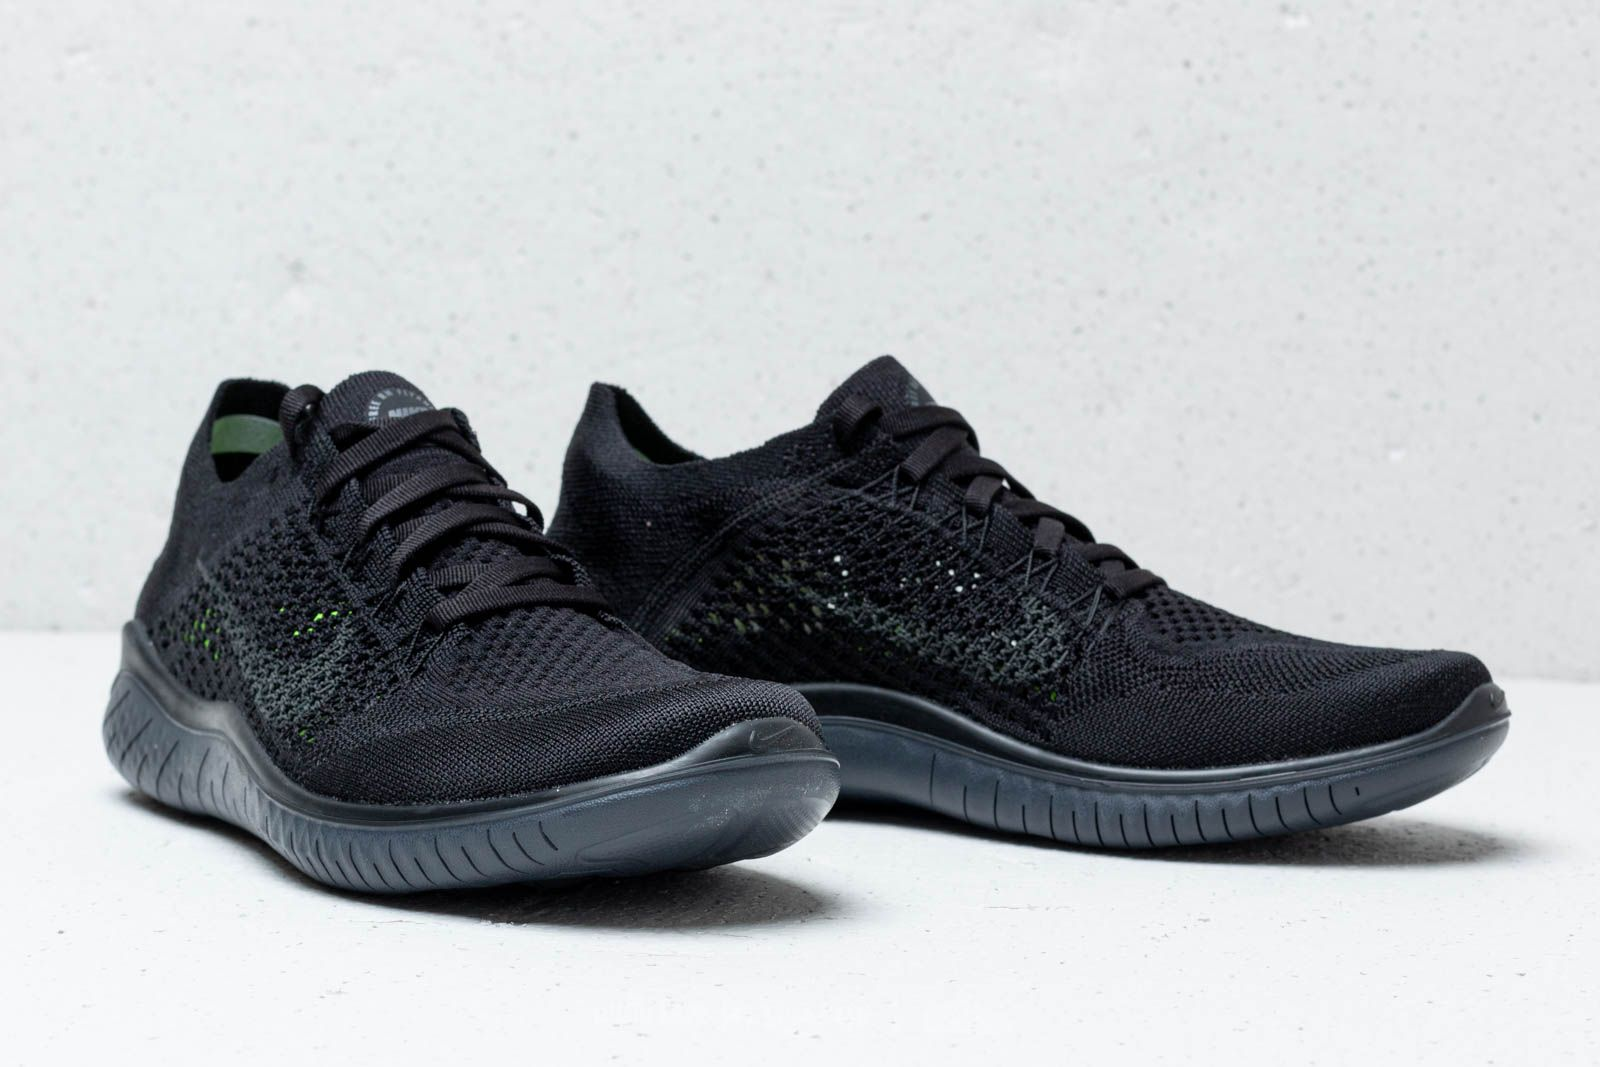 new style 2c256 7d05a Nike Wmns Free RN Flyknit 2018 Black  Anthracite a muy buen precio 129 €  comprar